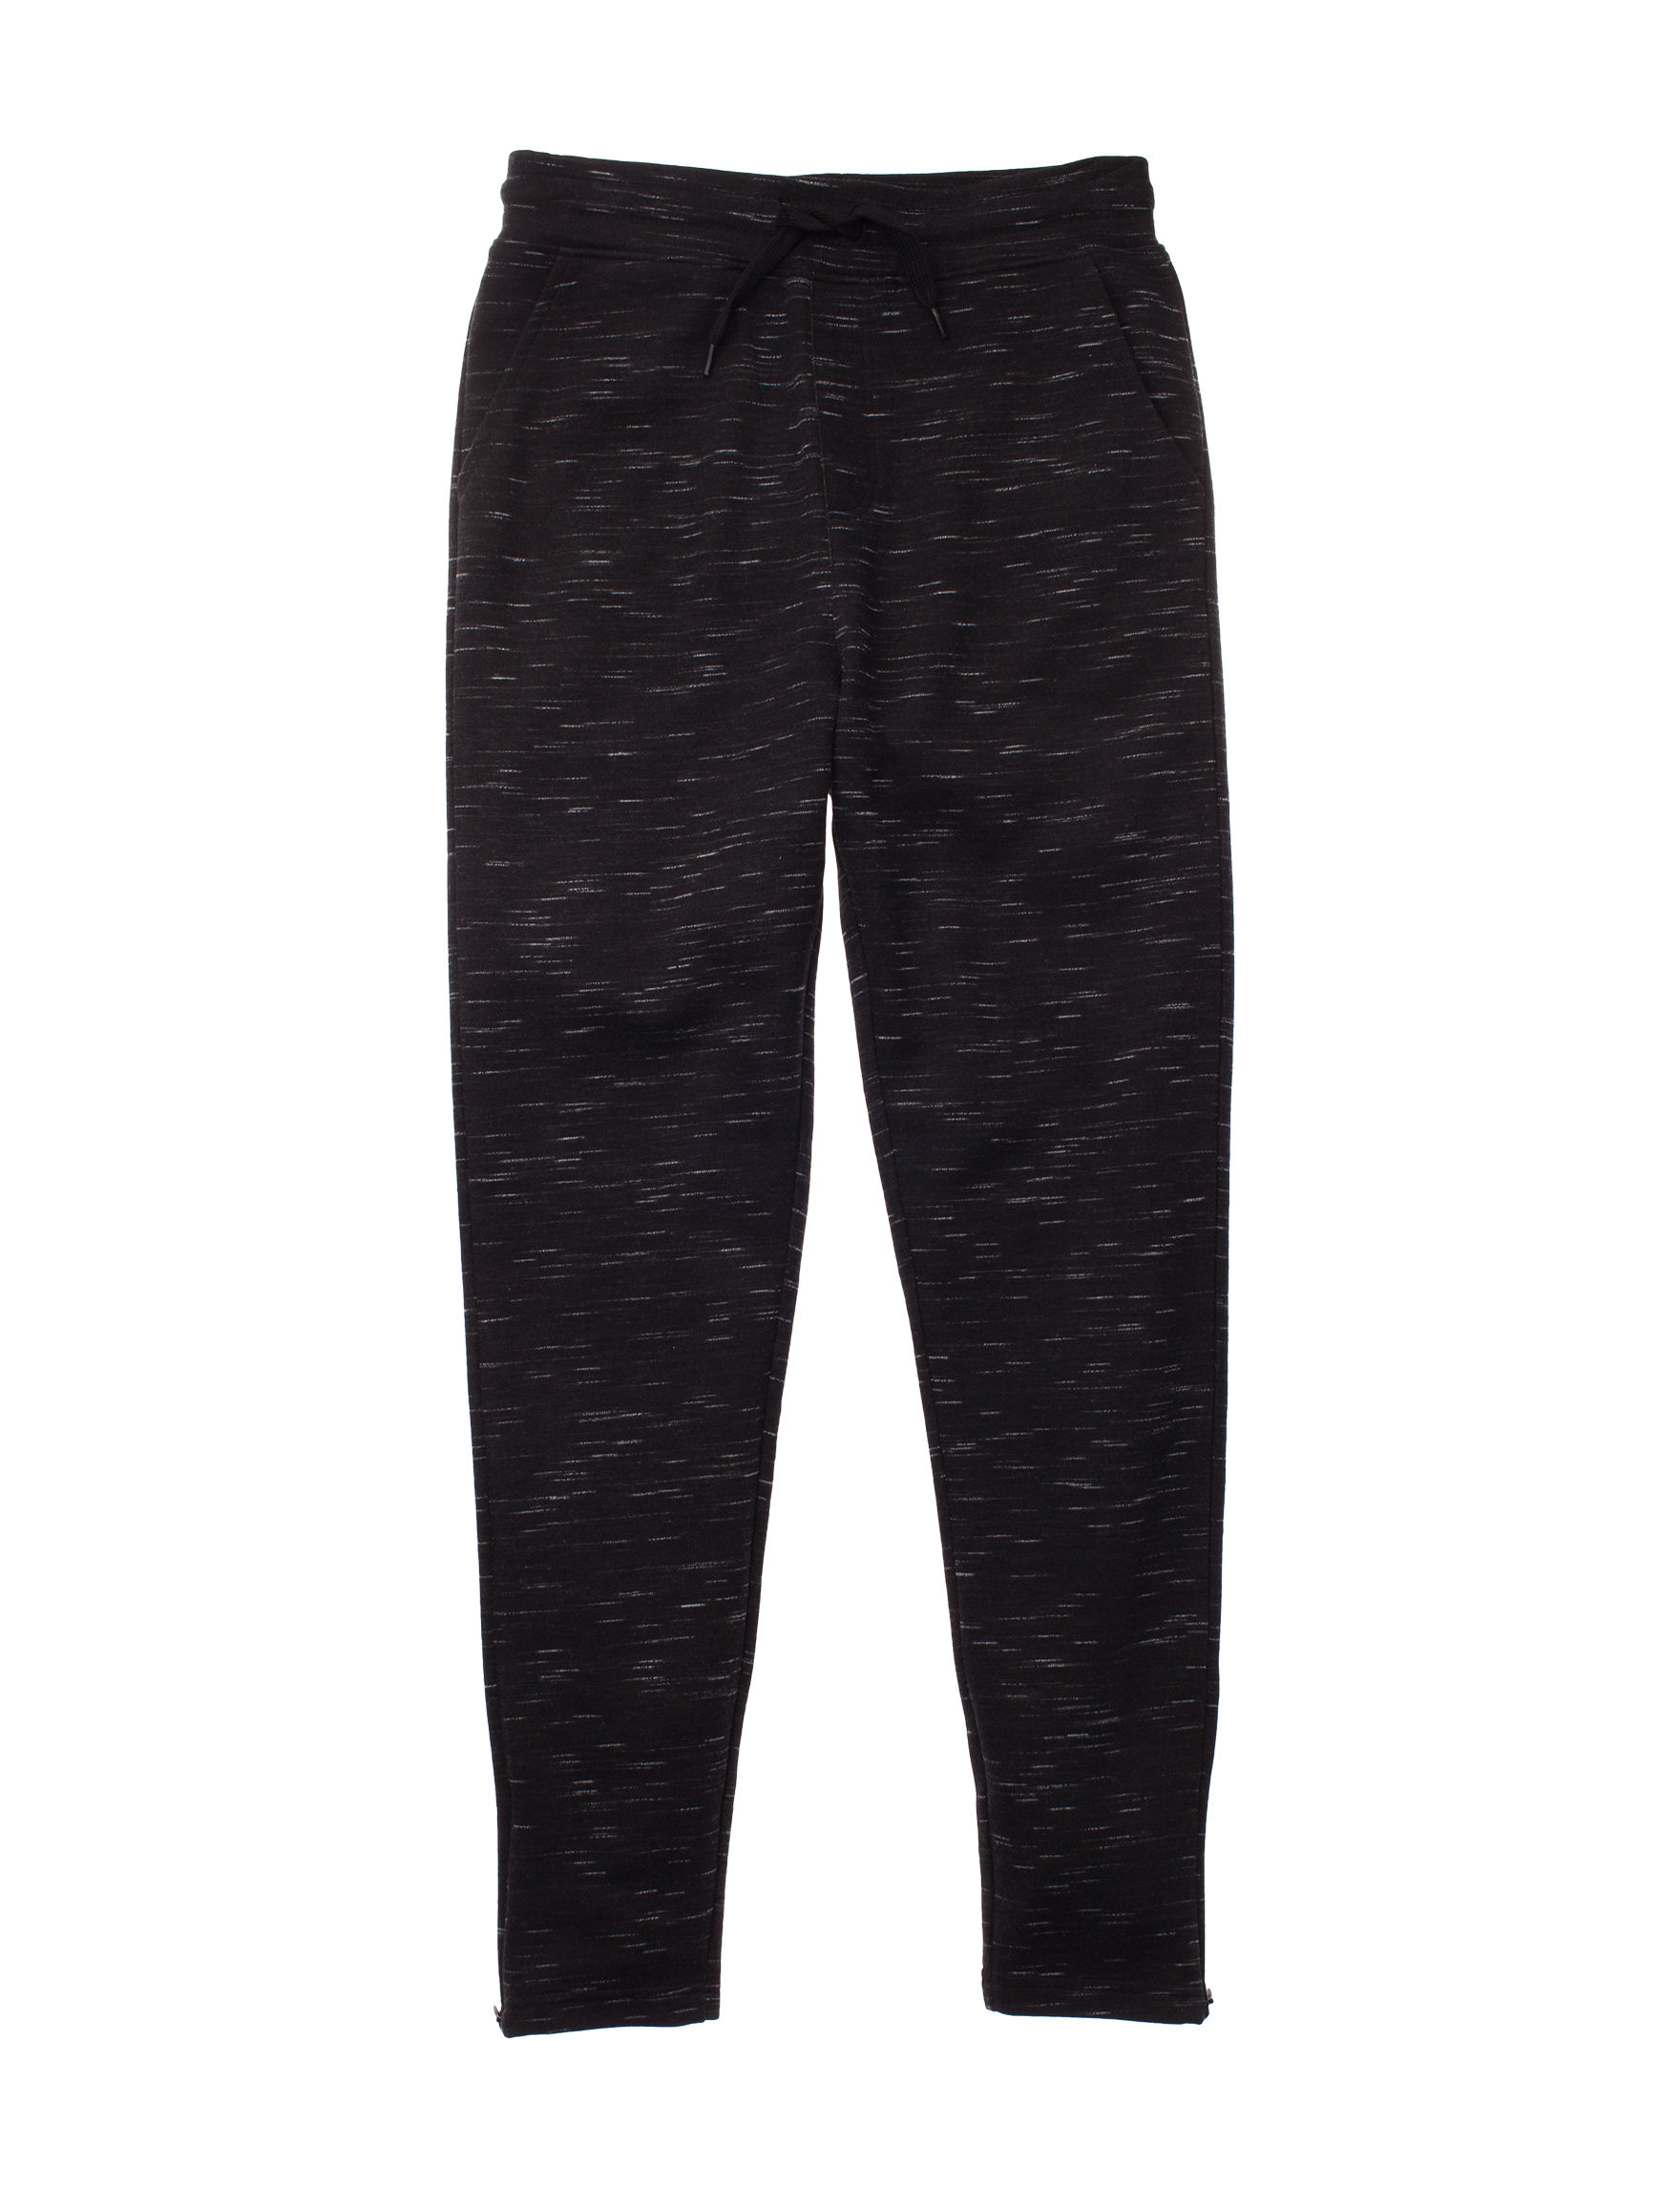 Rustic Blue Black Soft Pants